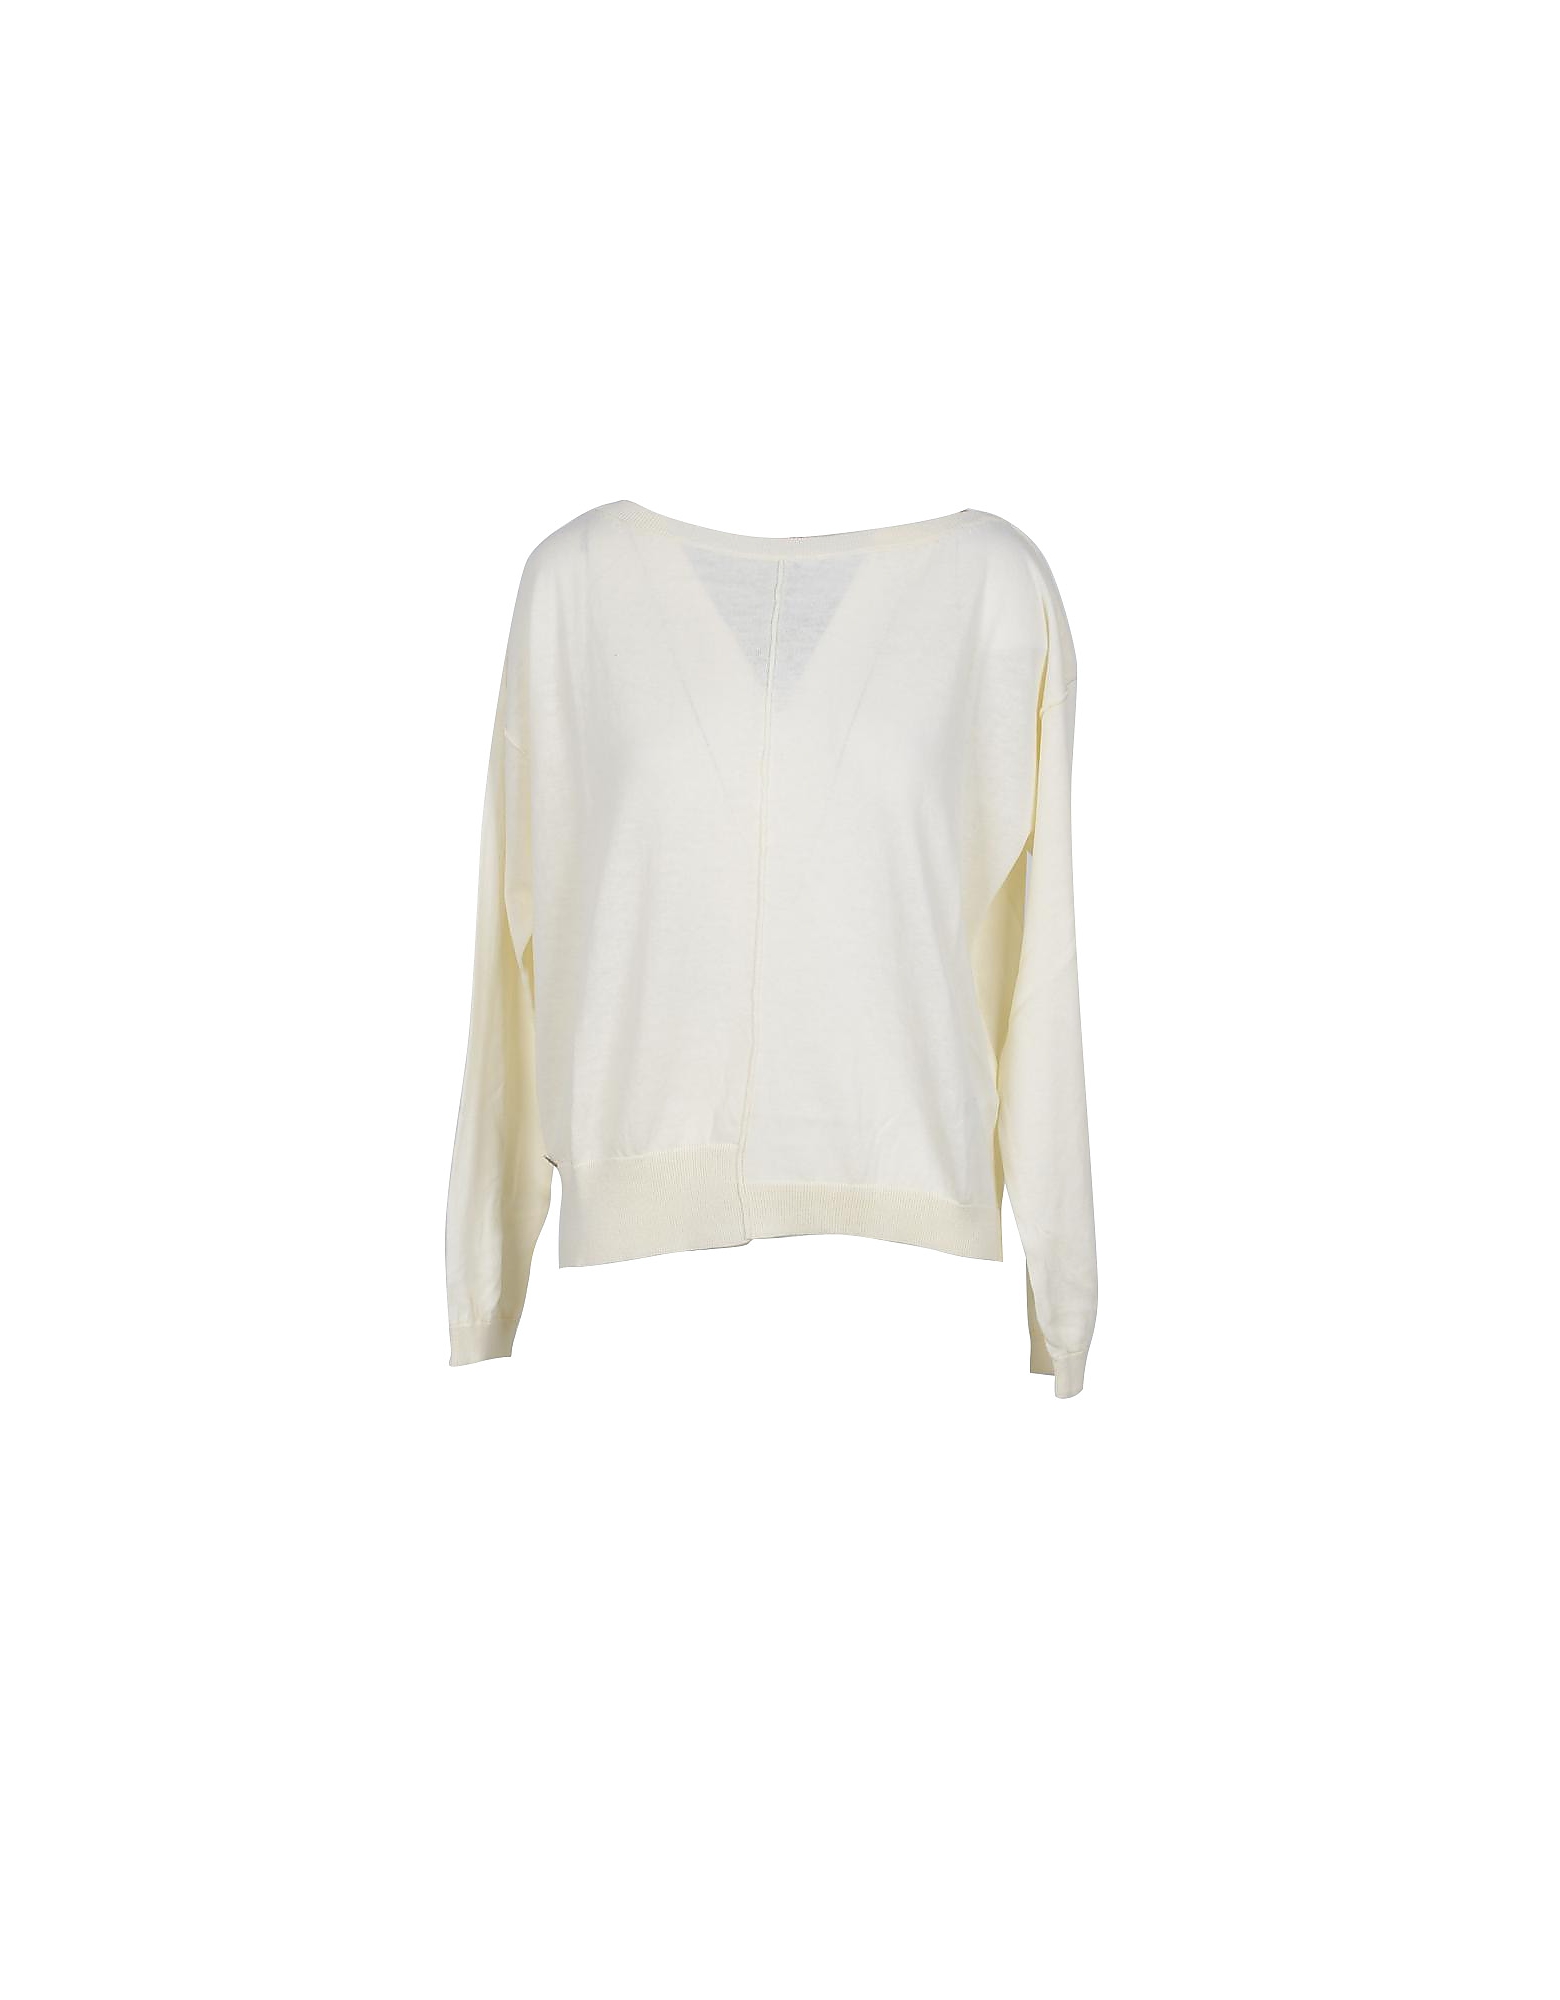 Manila Grace Designer Knitwear, White Cotton Women's Sweater